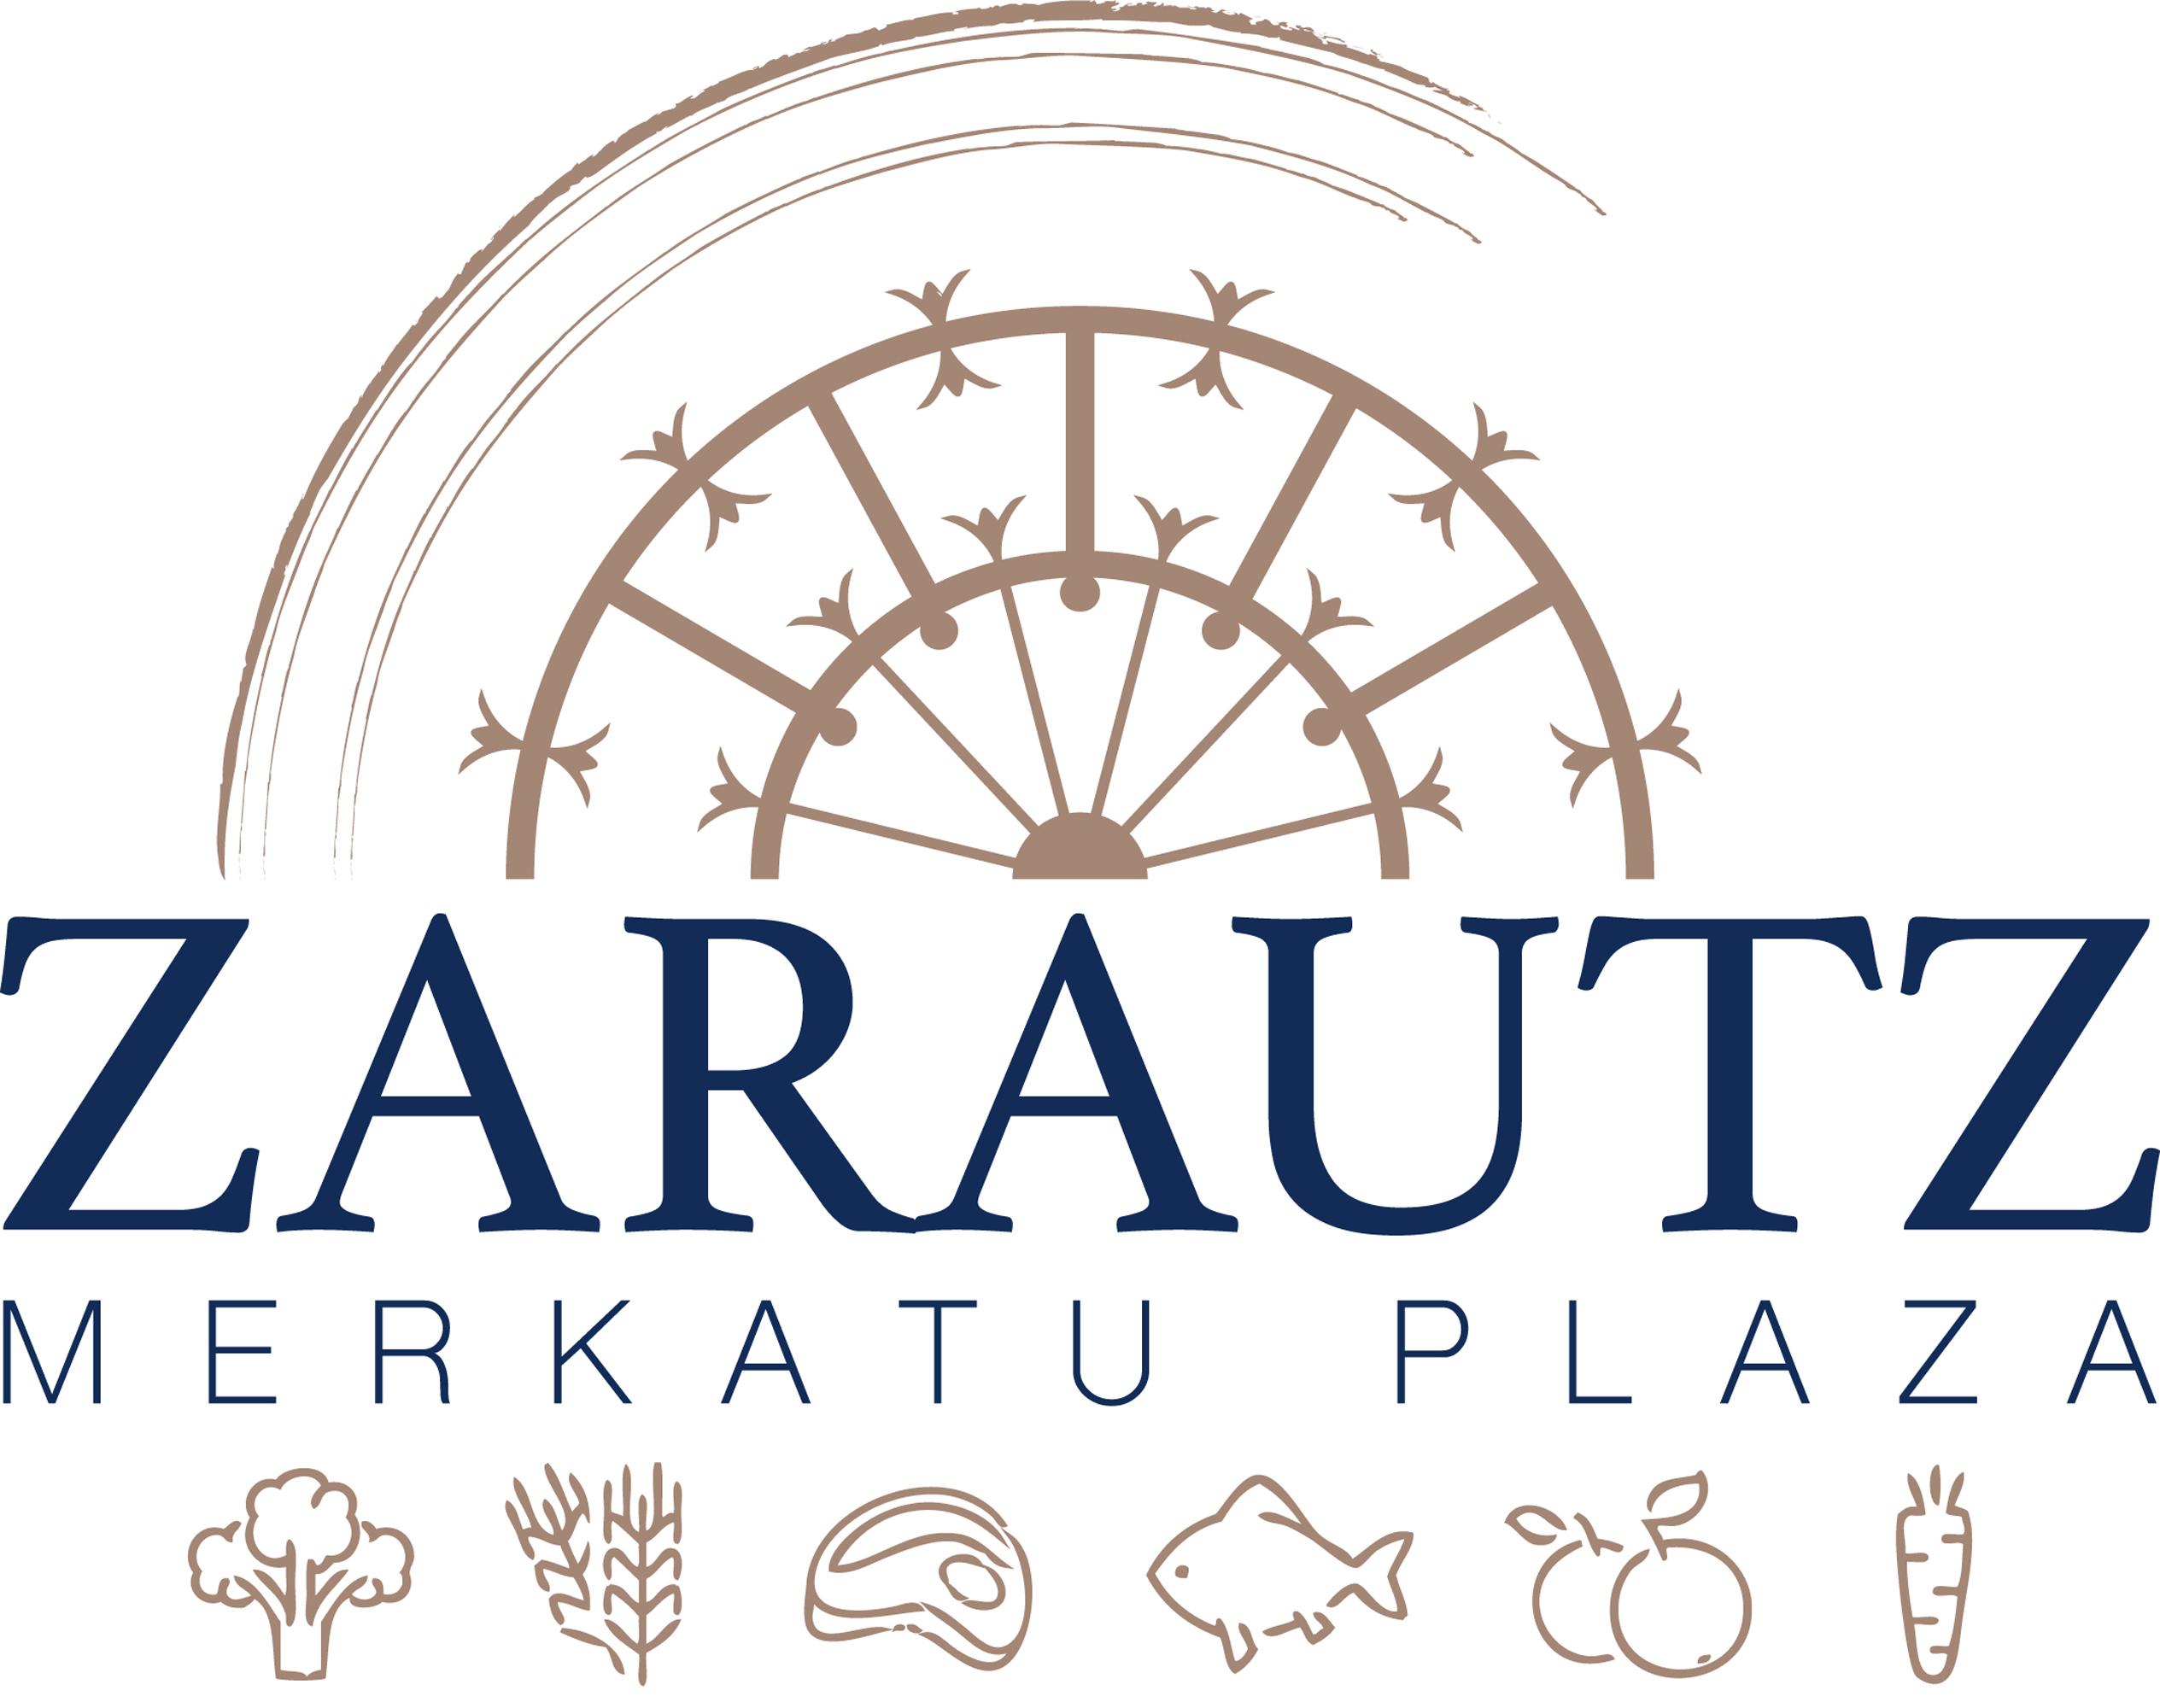 Logotipo Merkatuplaza